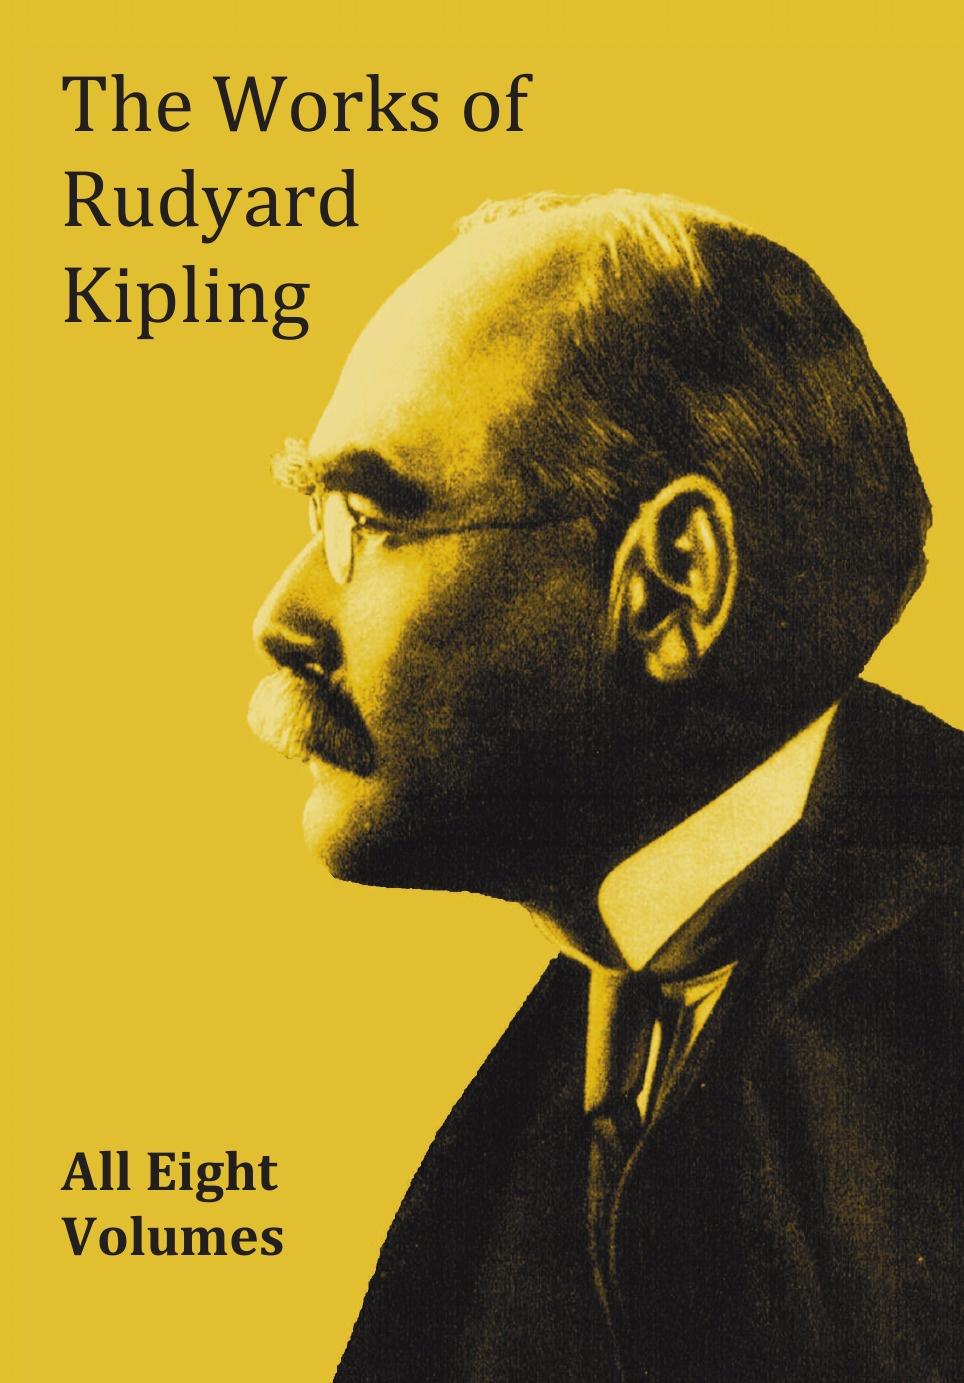 Rudyard Kipling The Works of Rudyard Kipling - 8 Volumes from the Complete Works in One Edition цена и фото